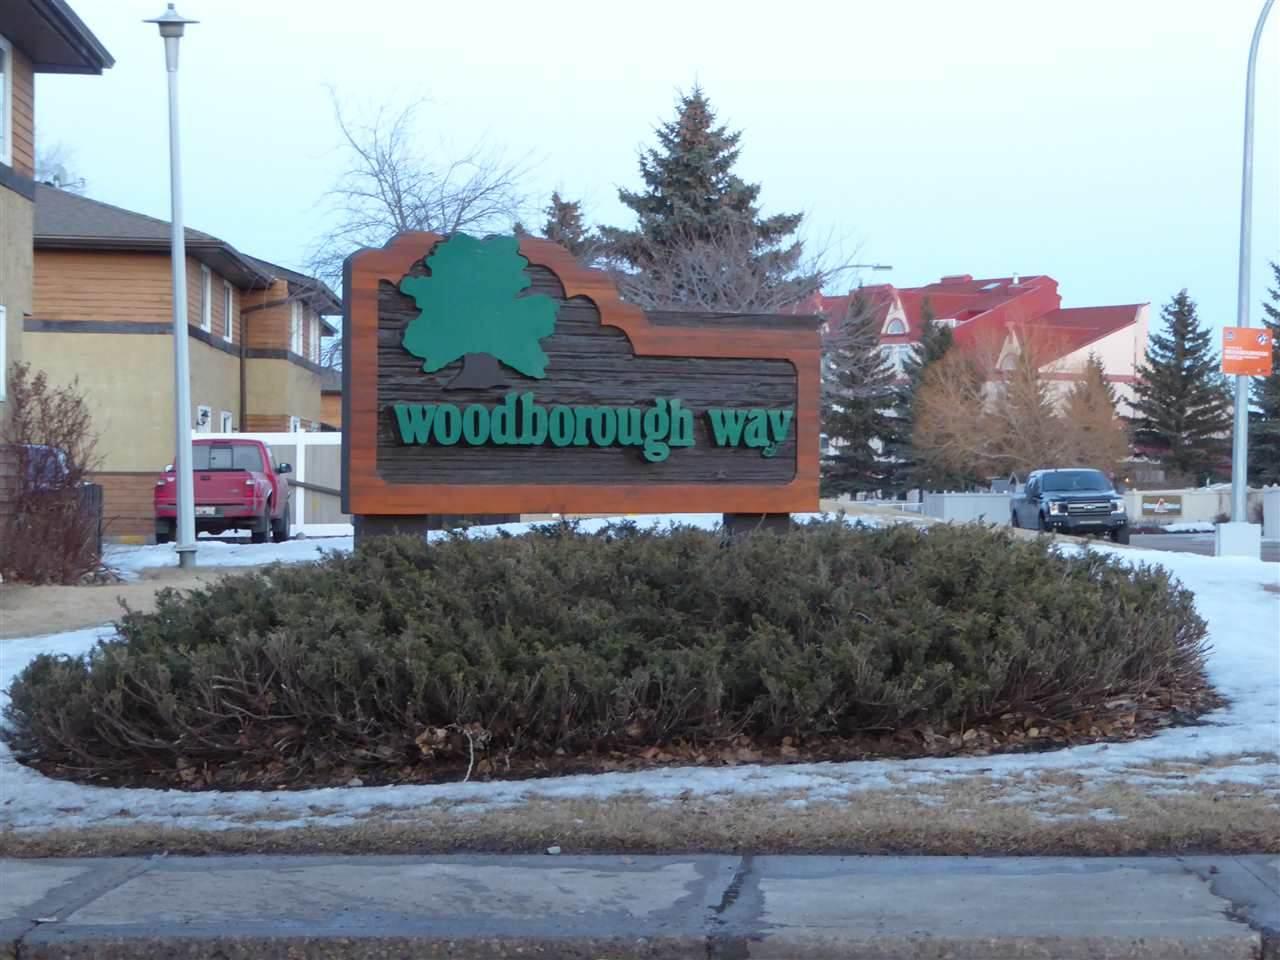 140 Woodborough Way - Photo 1